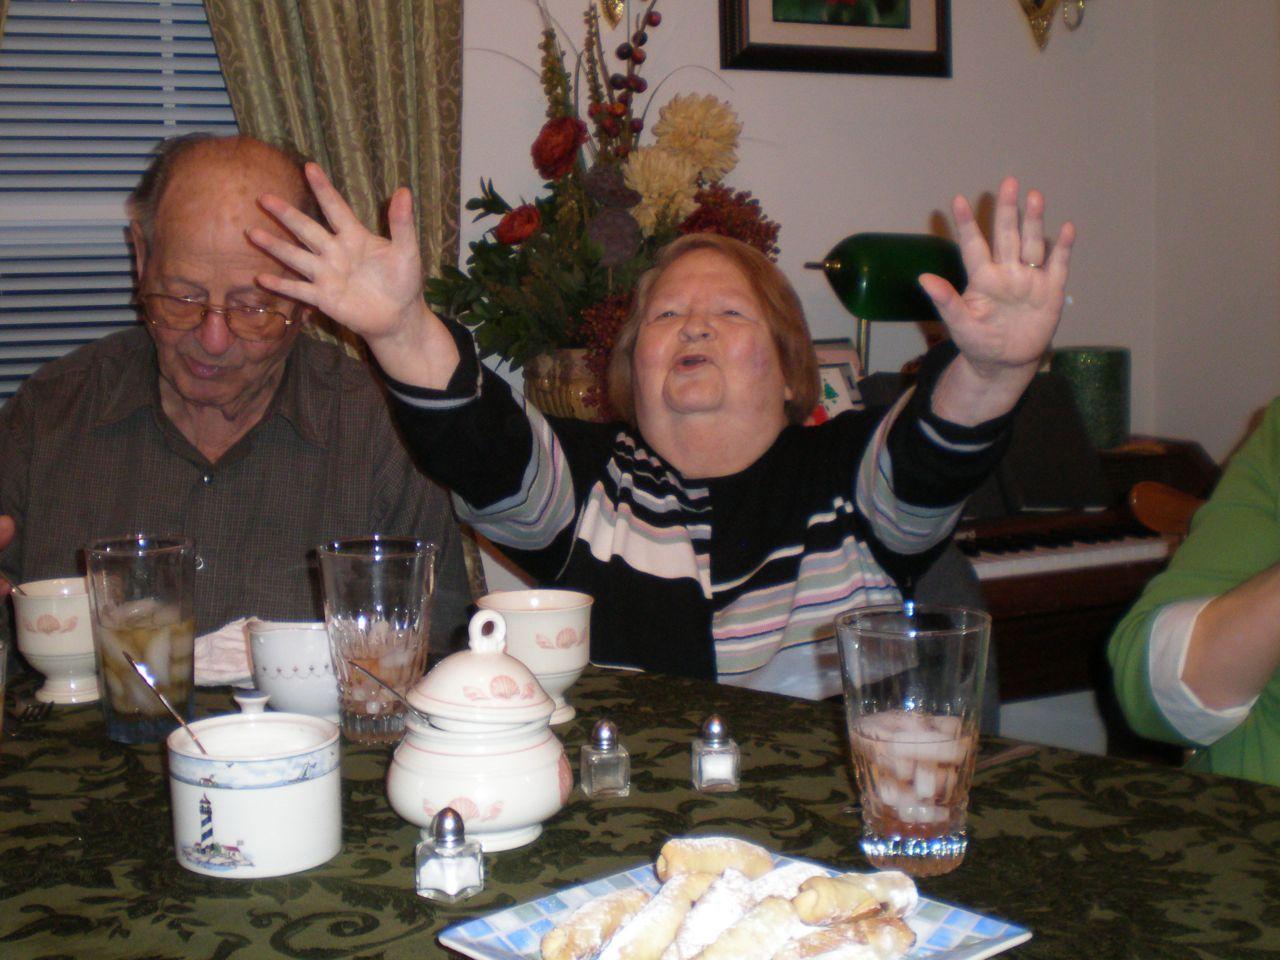 Lois celebrating - loving life!